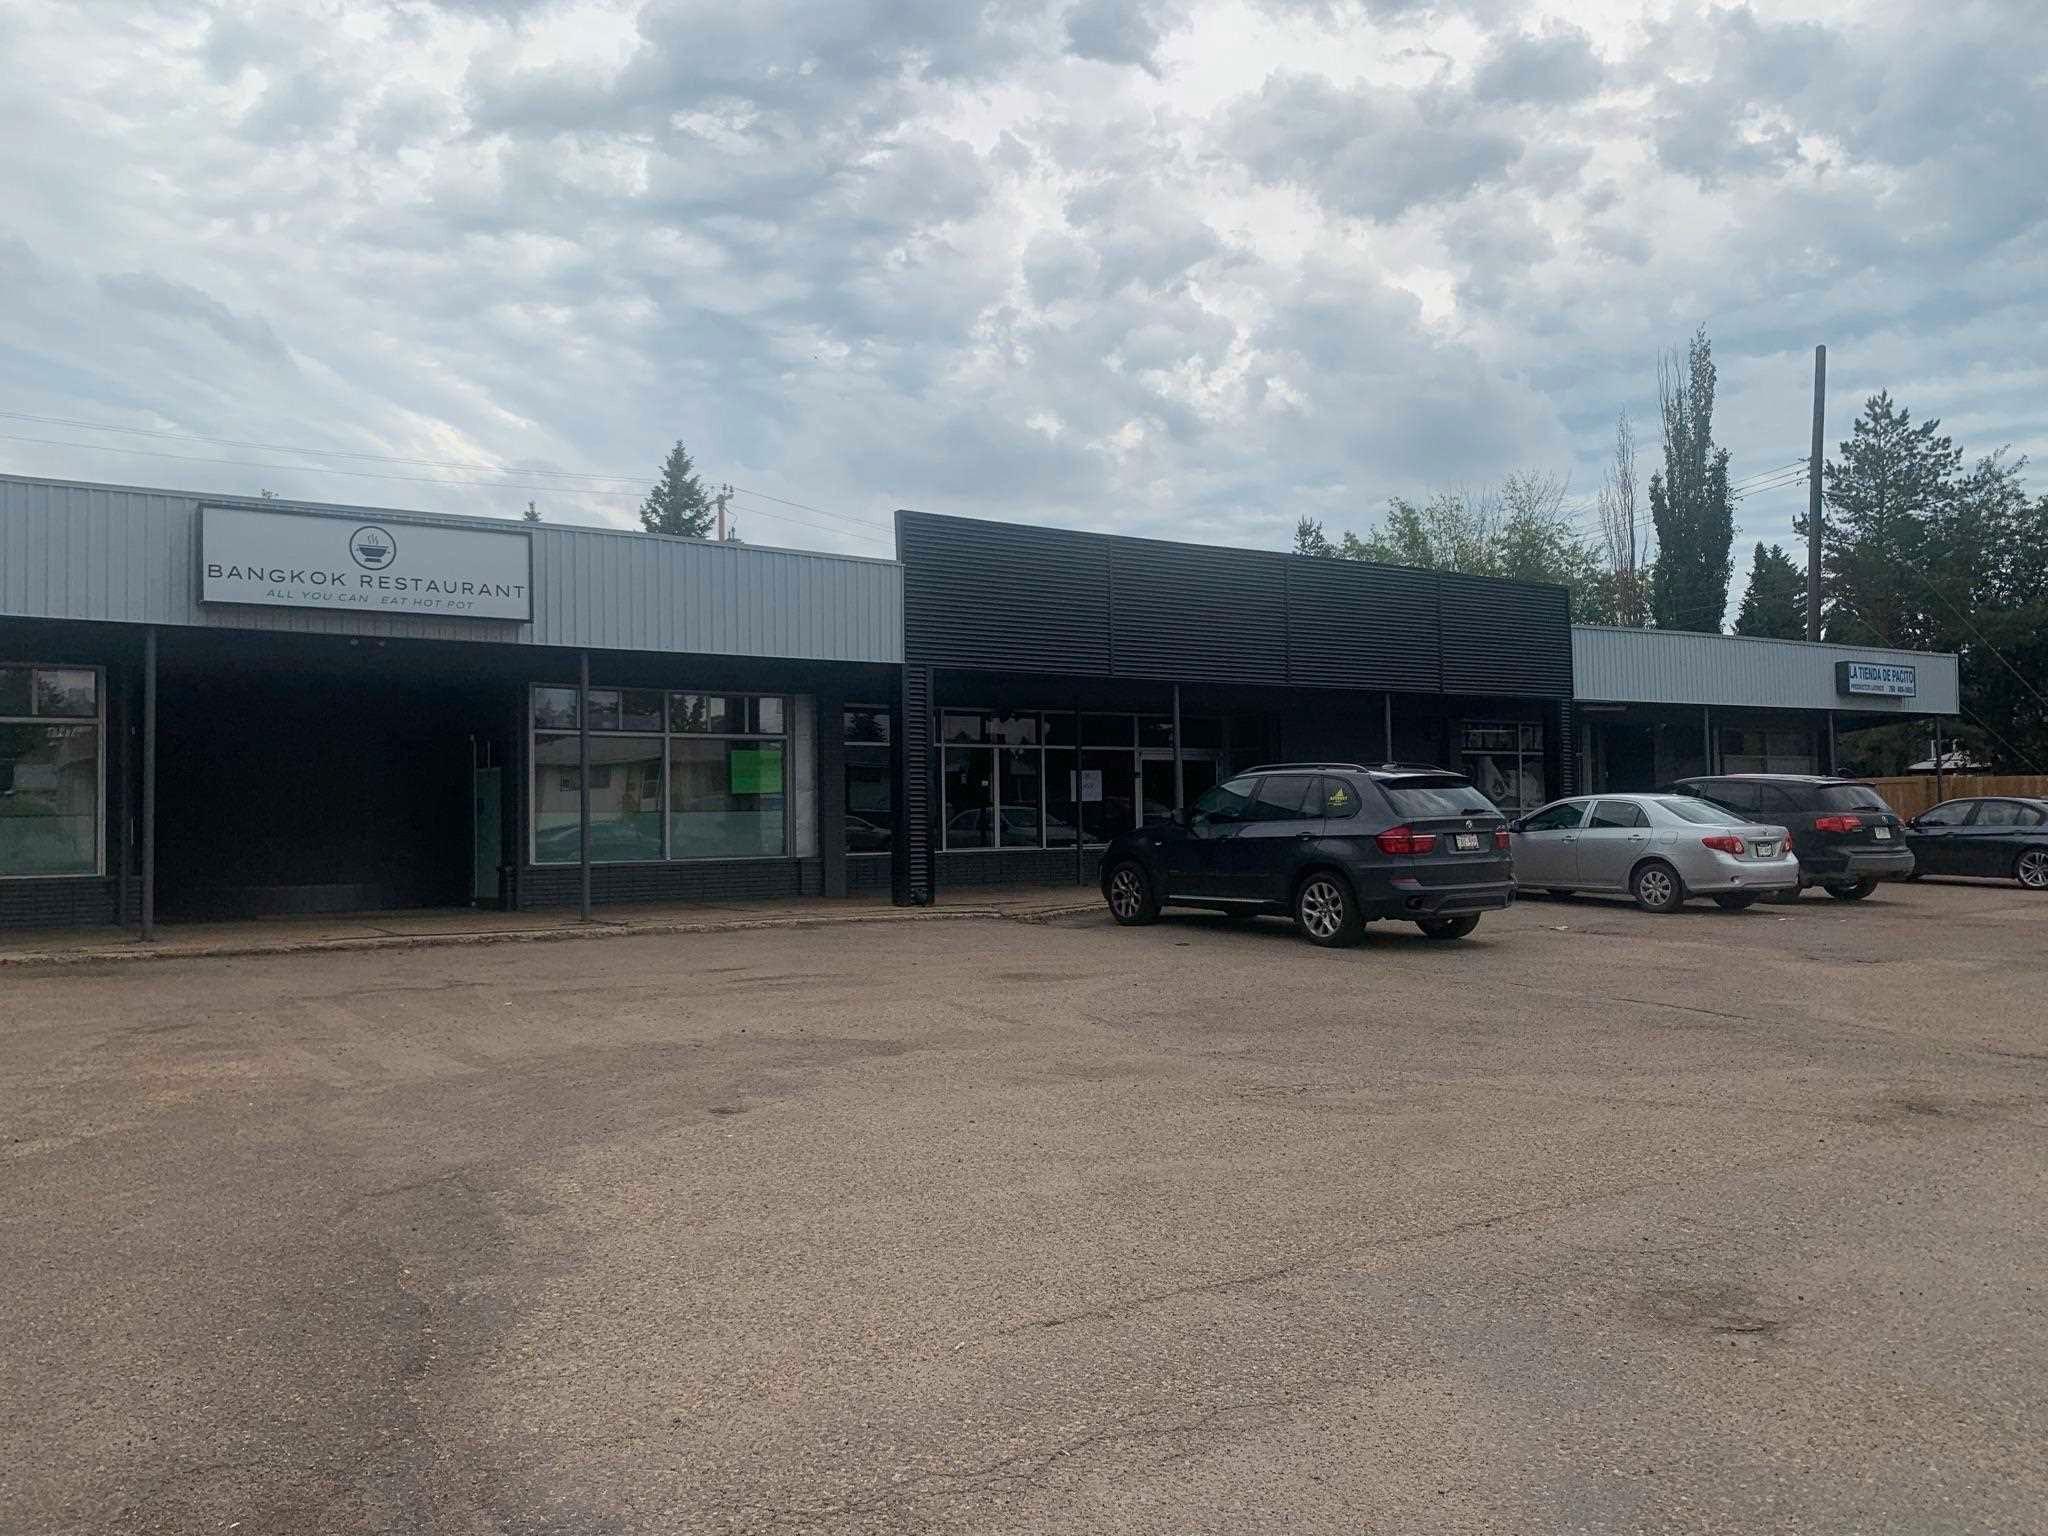 Main Photo: 11468 112 Avenue in Edmonton: Zone 08 Retail for lease : MLS®# E4252073